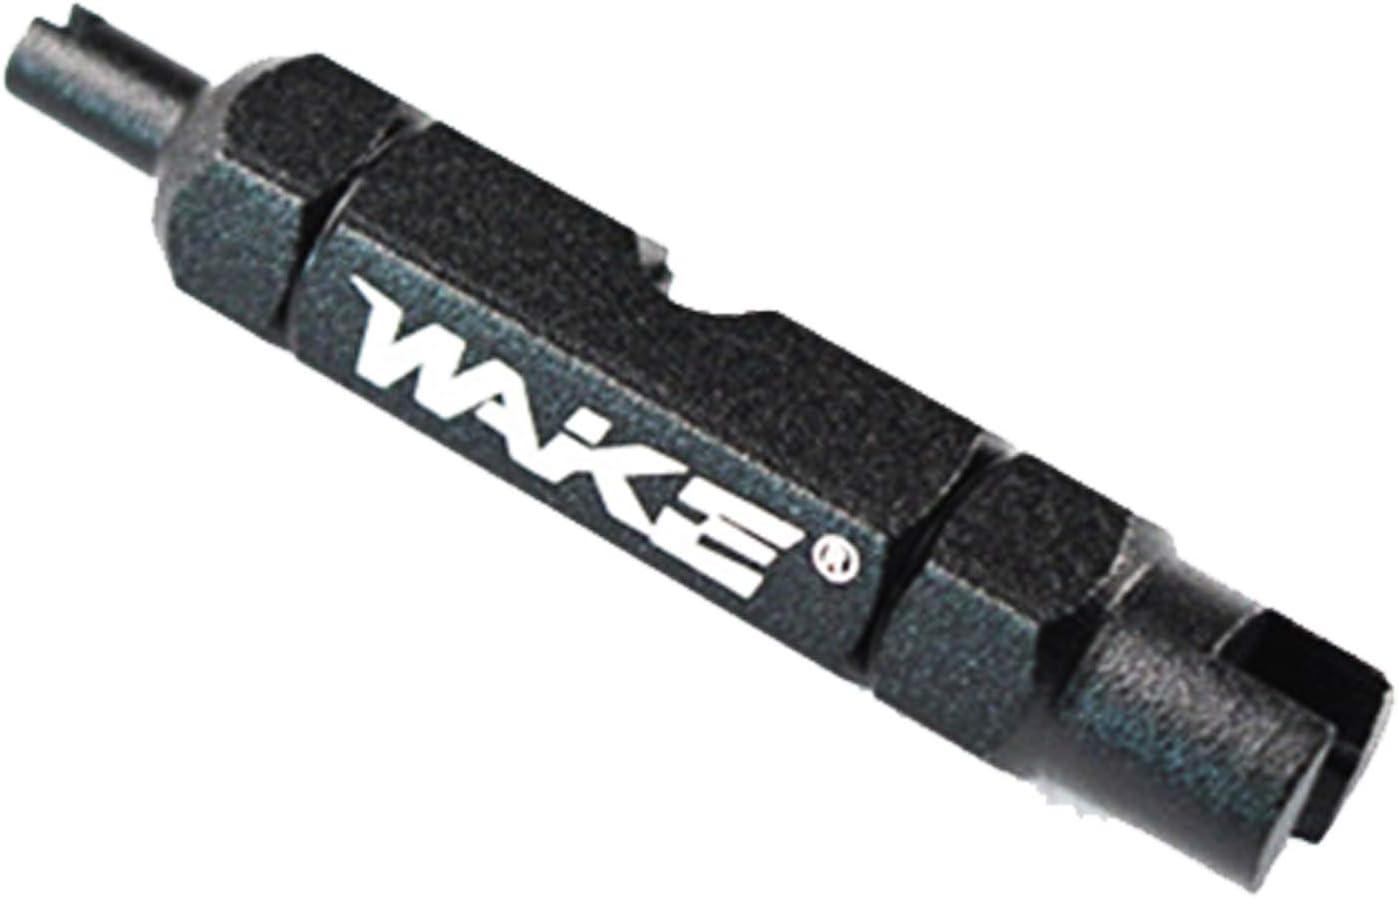 Valve Core Remover Air-Valve Spanner Disassembly Wrench Bike Valve Tool